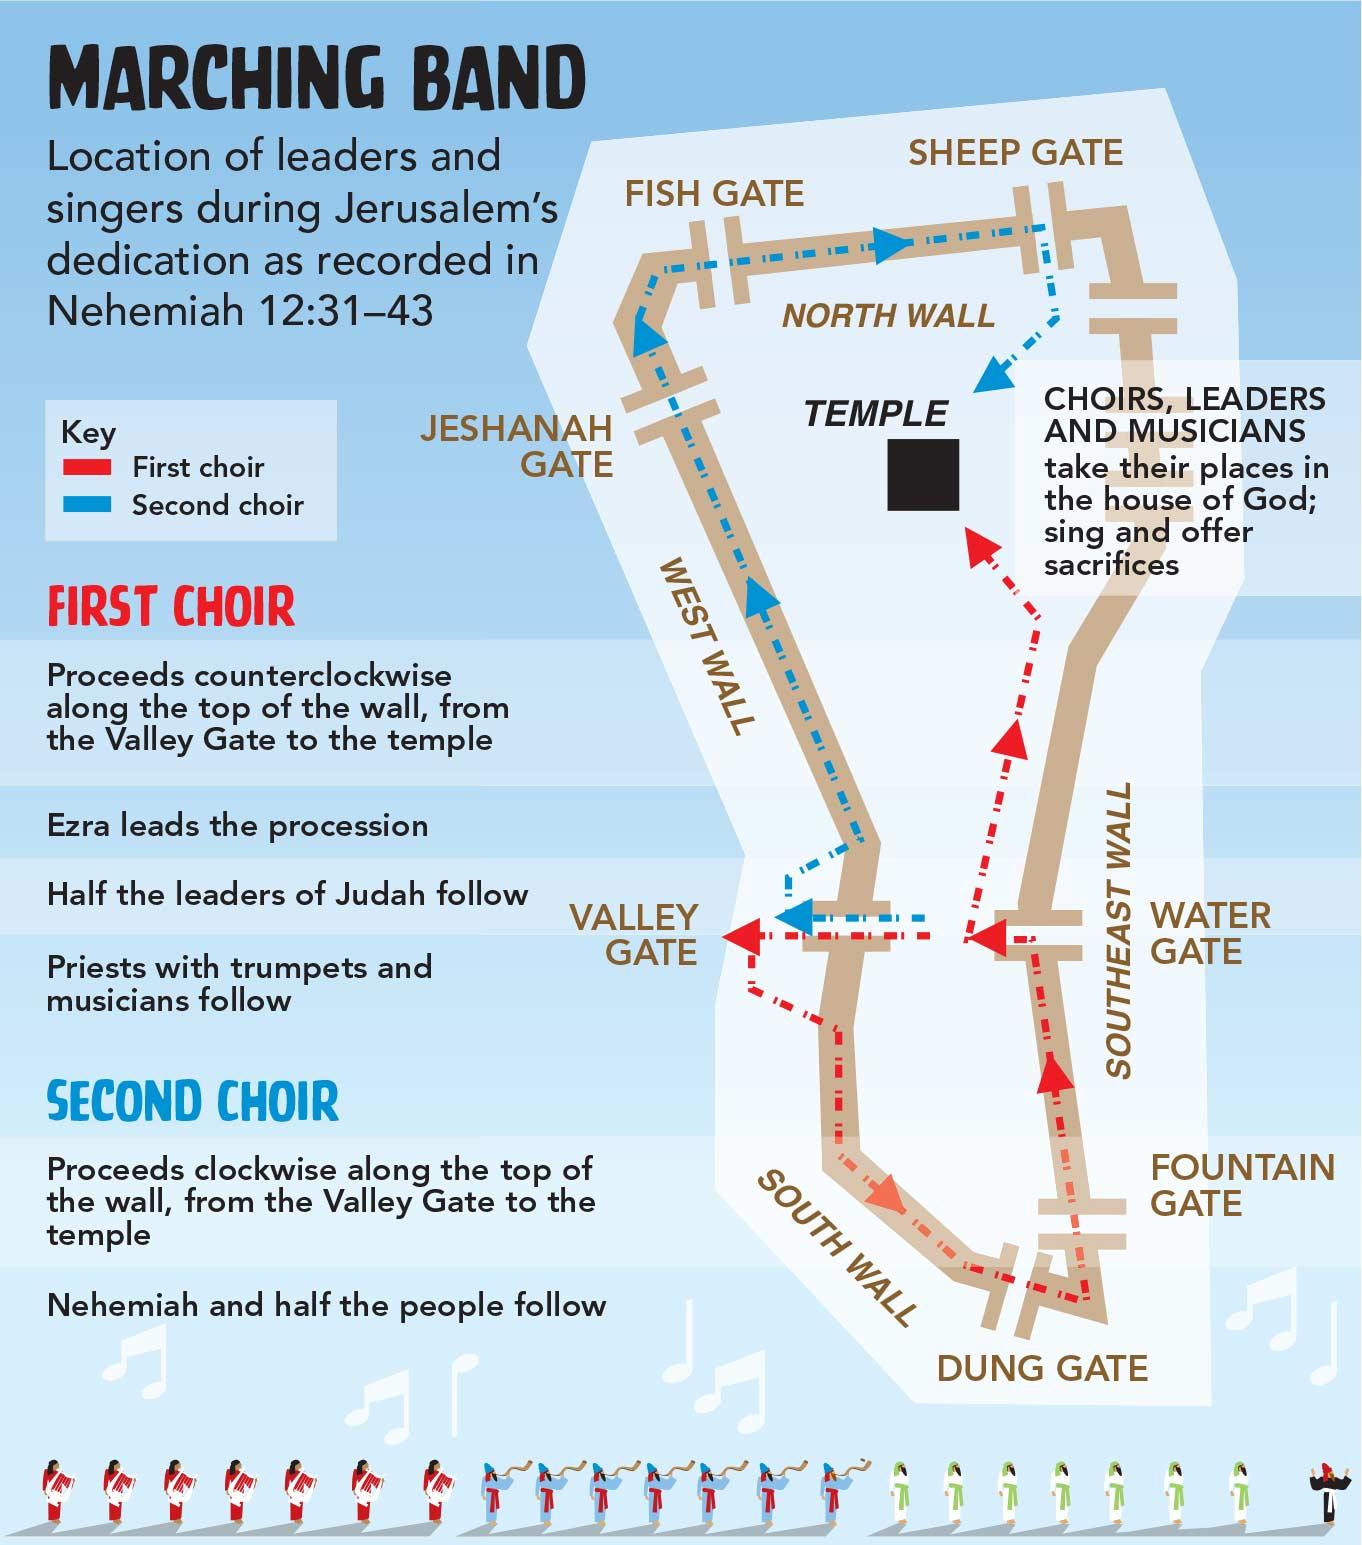 9780310758600_nivkidsvisual_marchingband_infographic